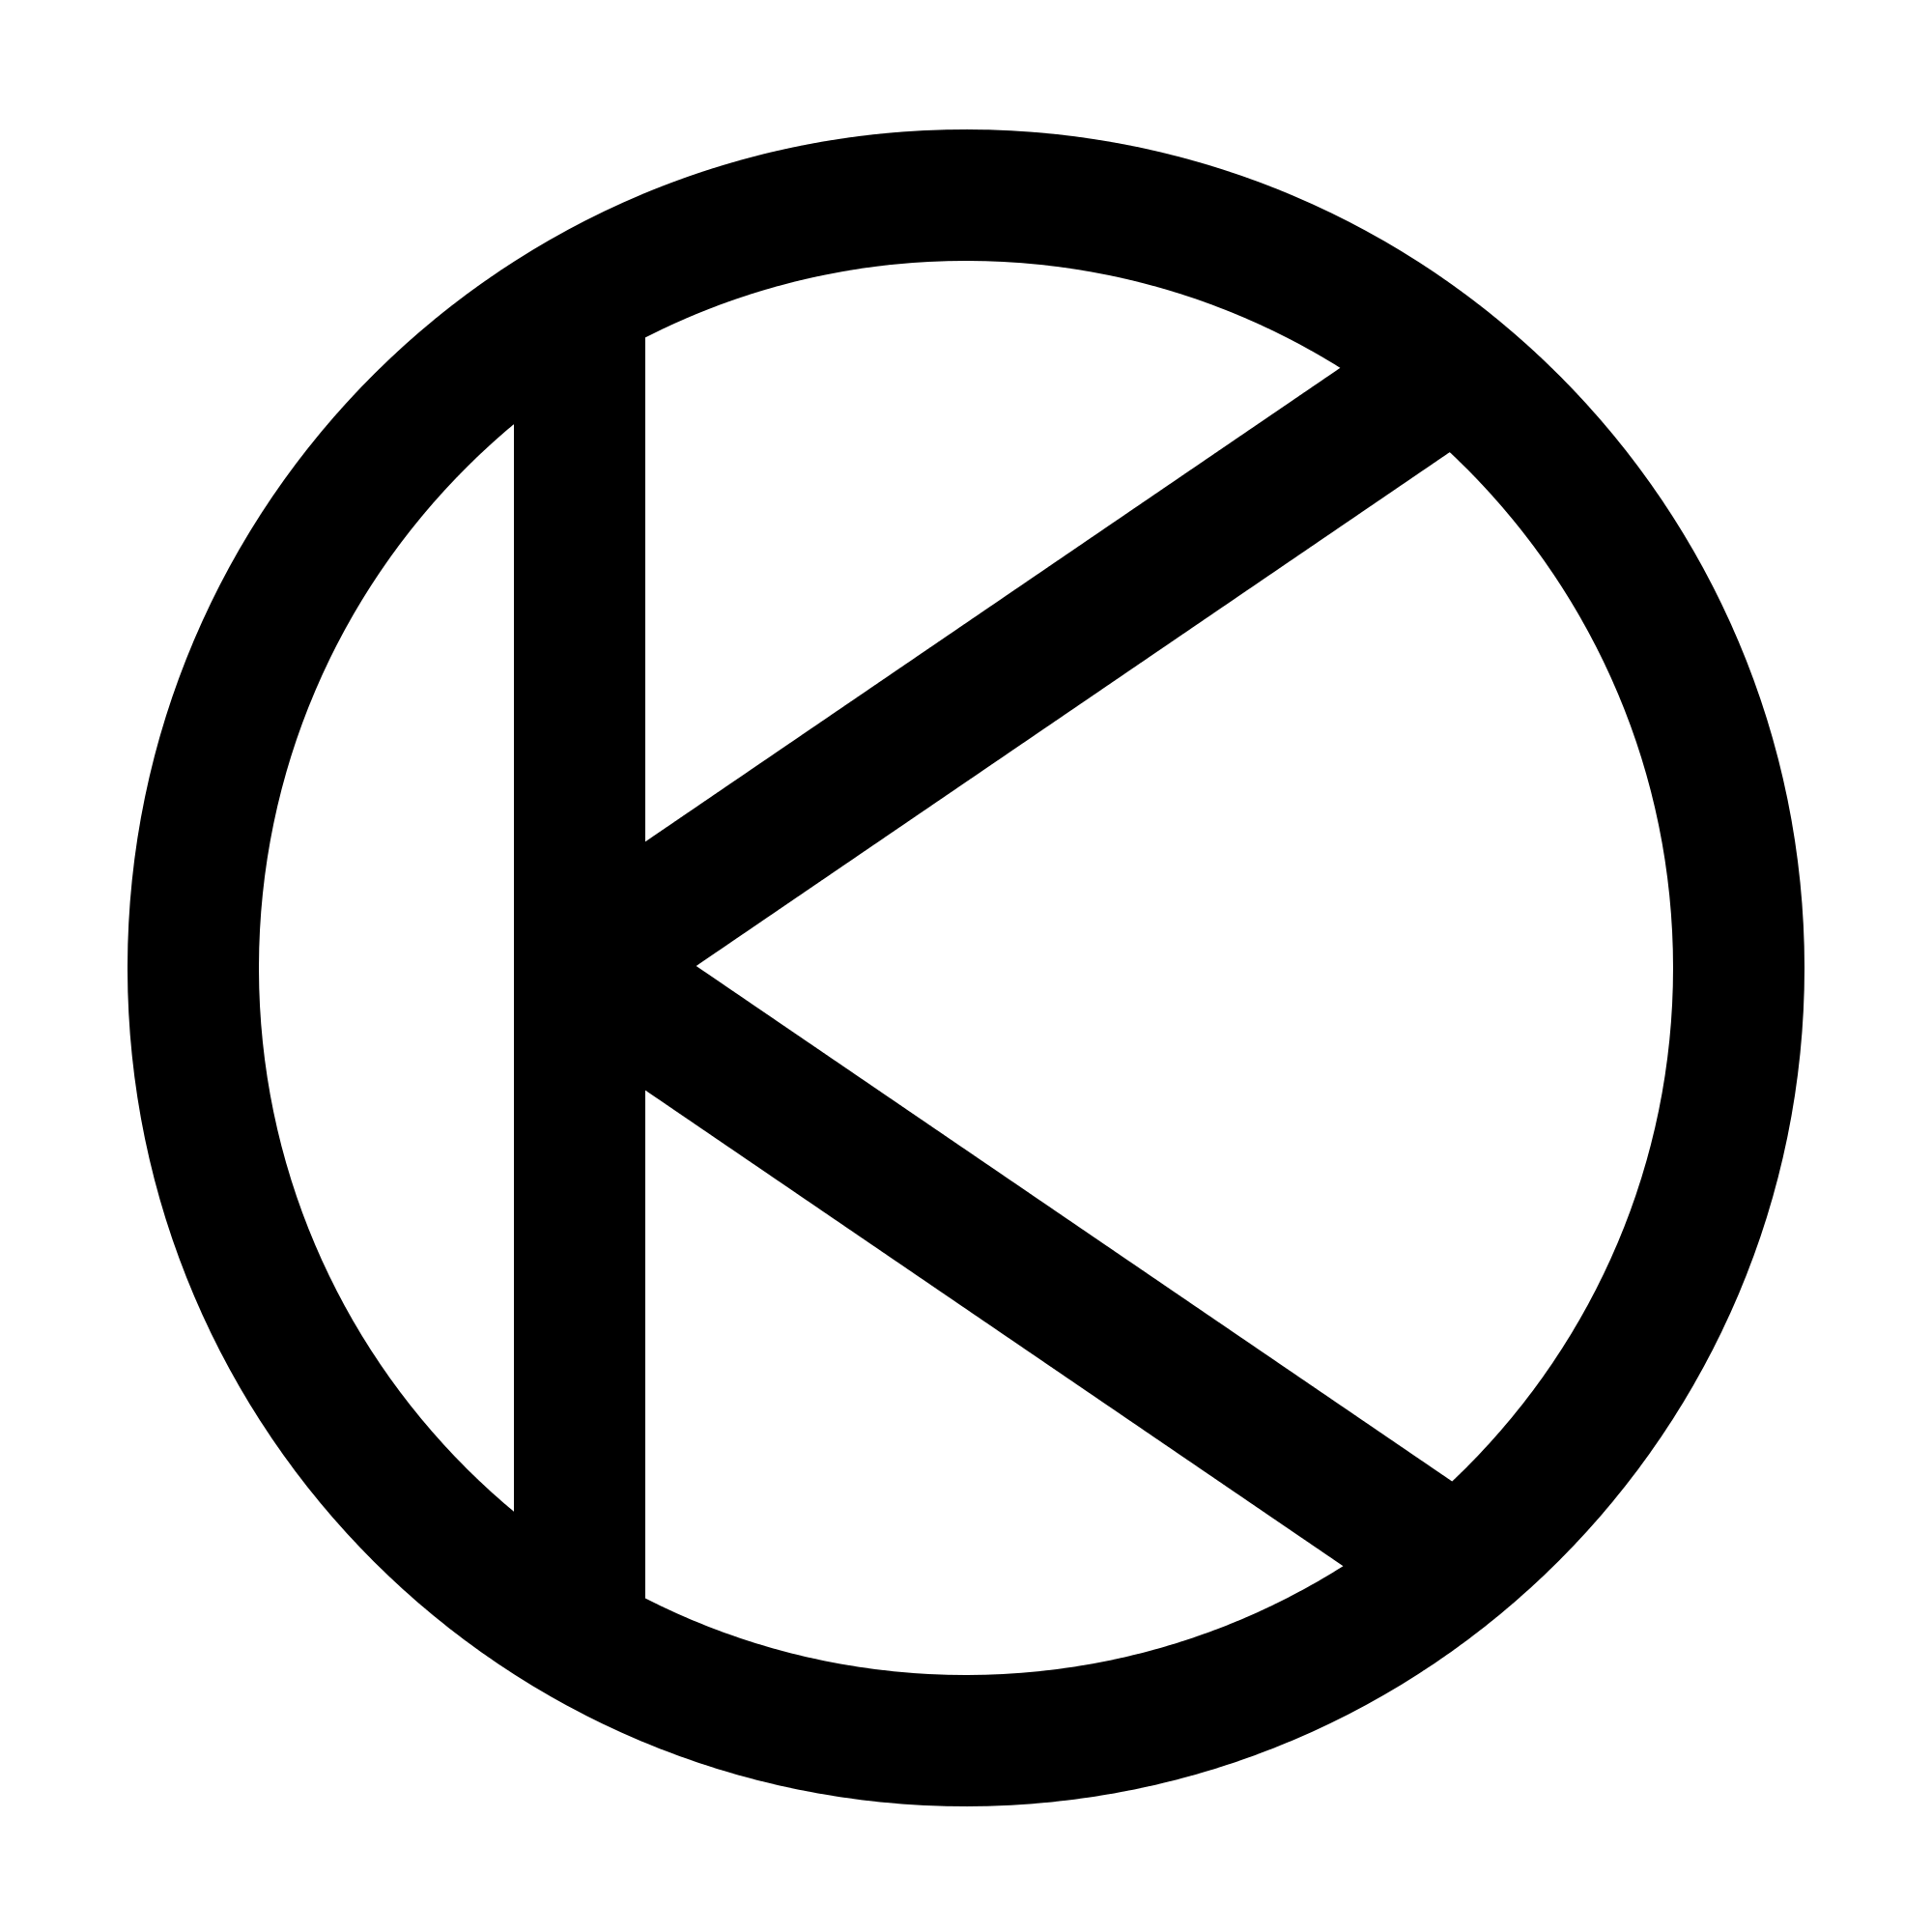 Eris Symbol Greek에 대한 이미지 검색결과 표지